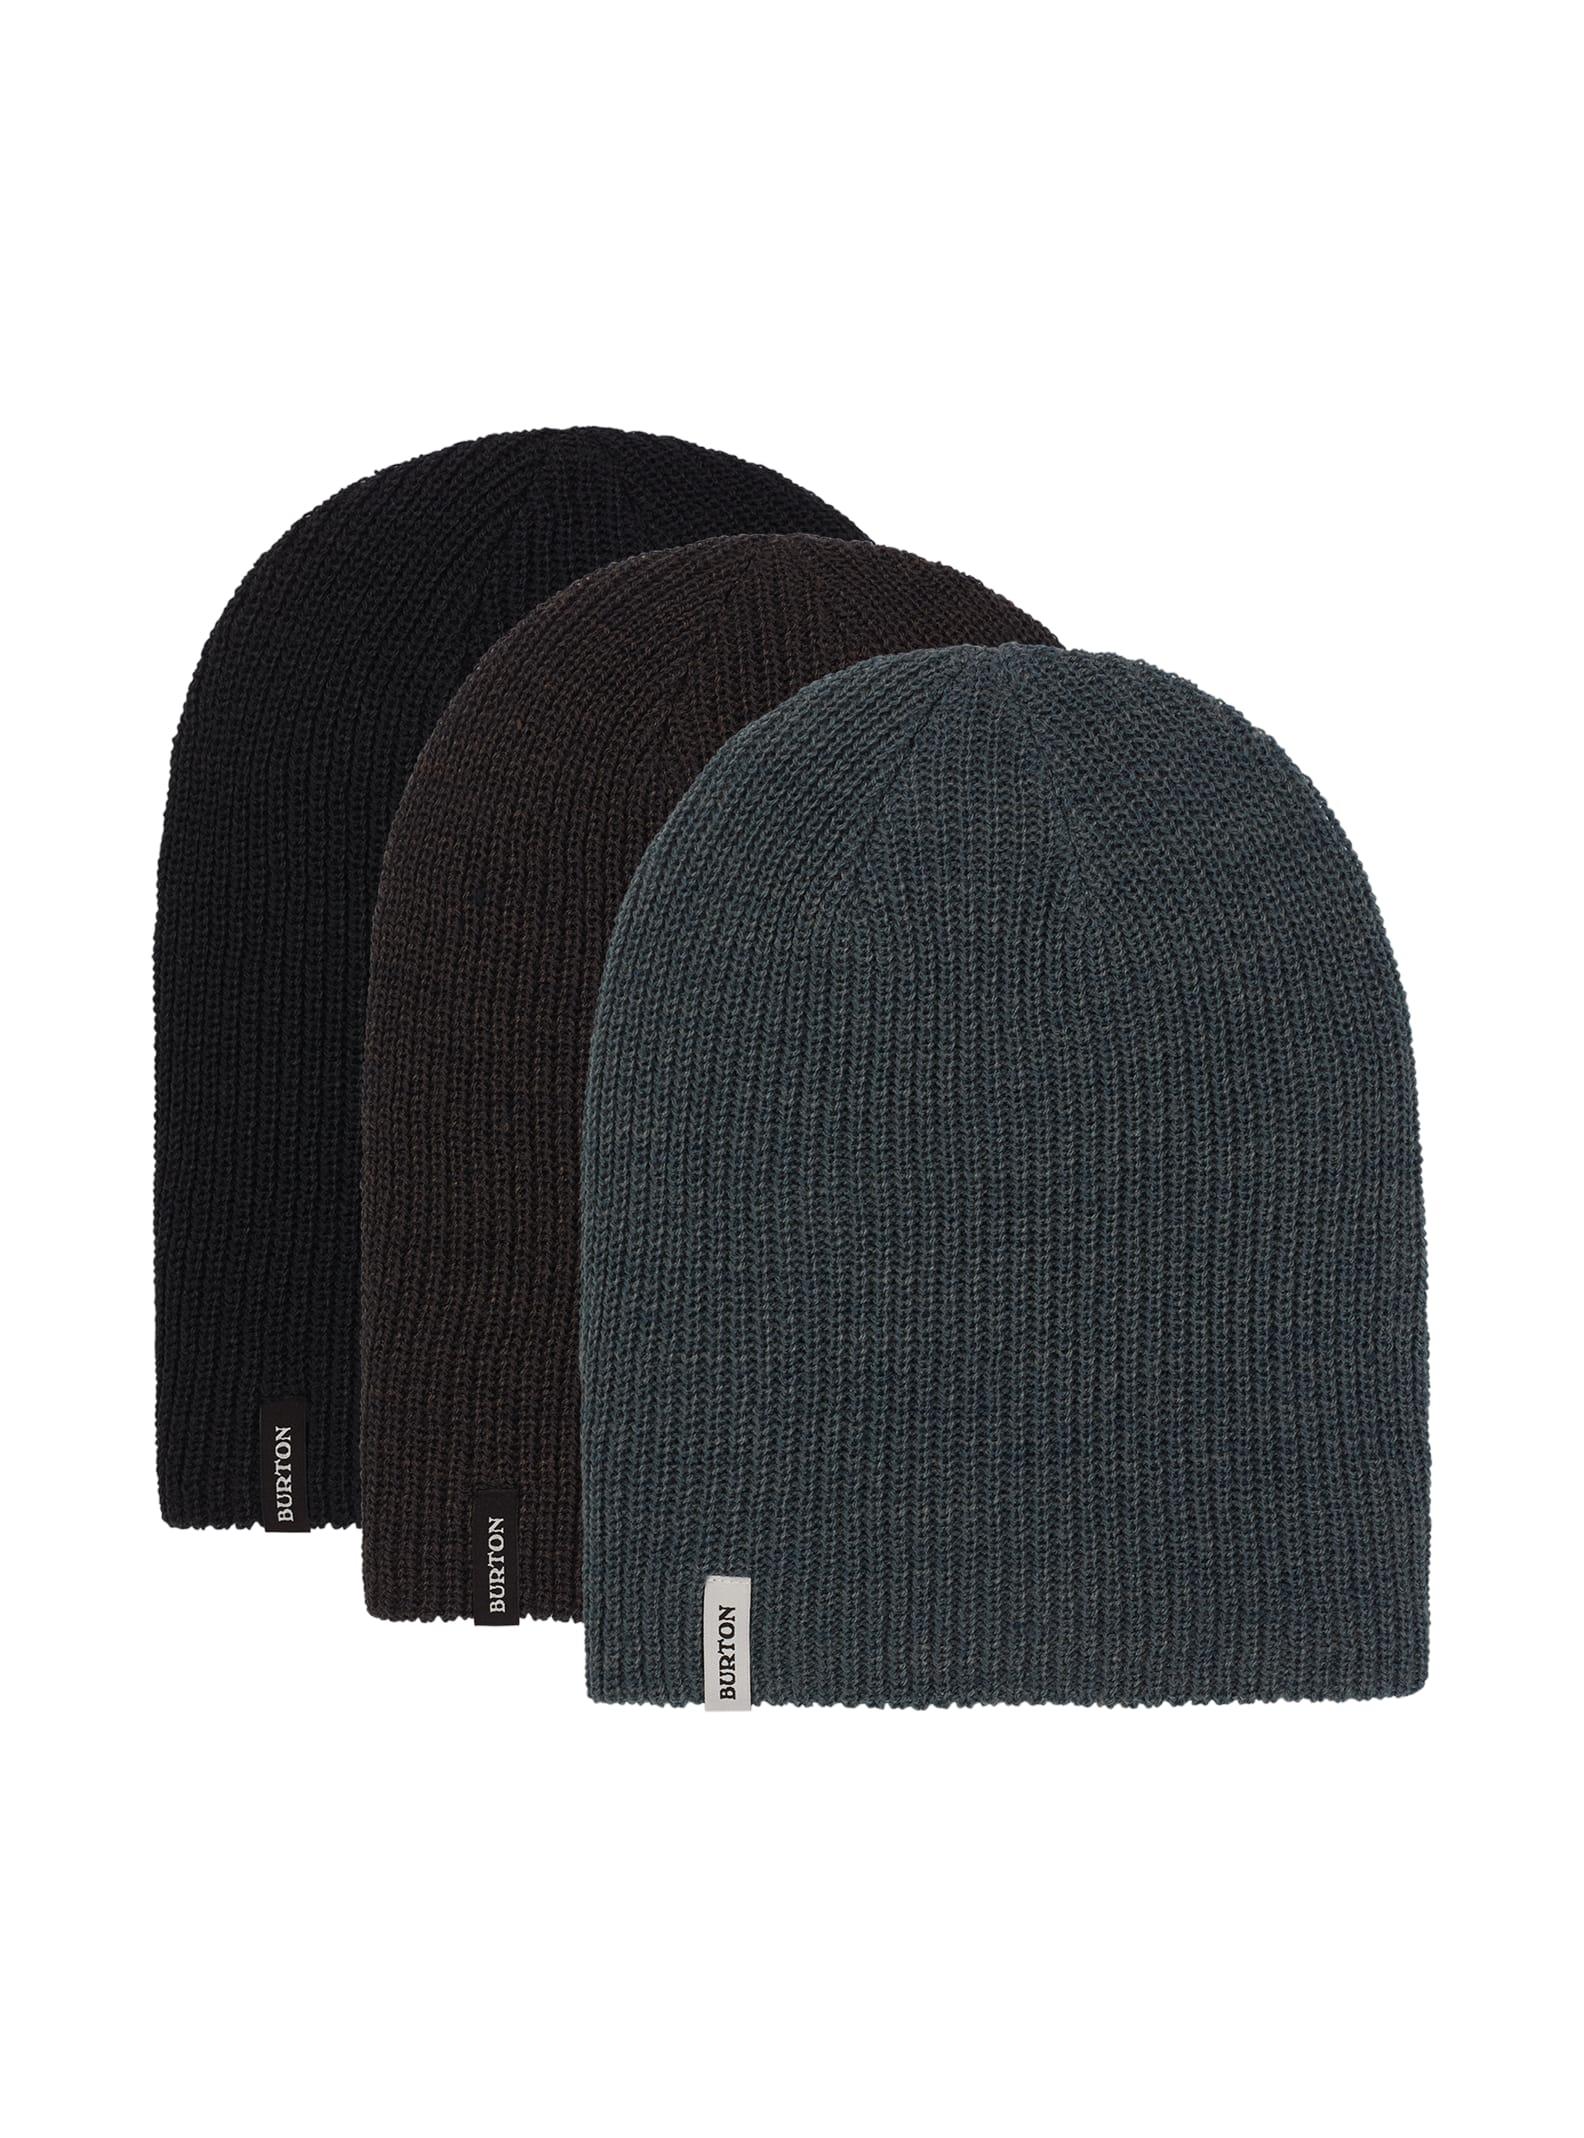 0b4f09ebf Women's Hats & Beanies | Burton Snowboards